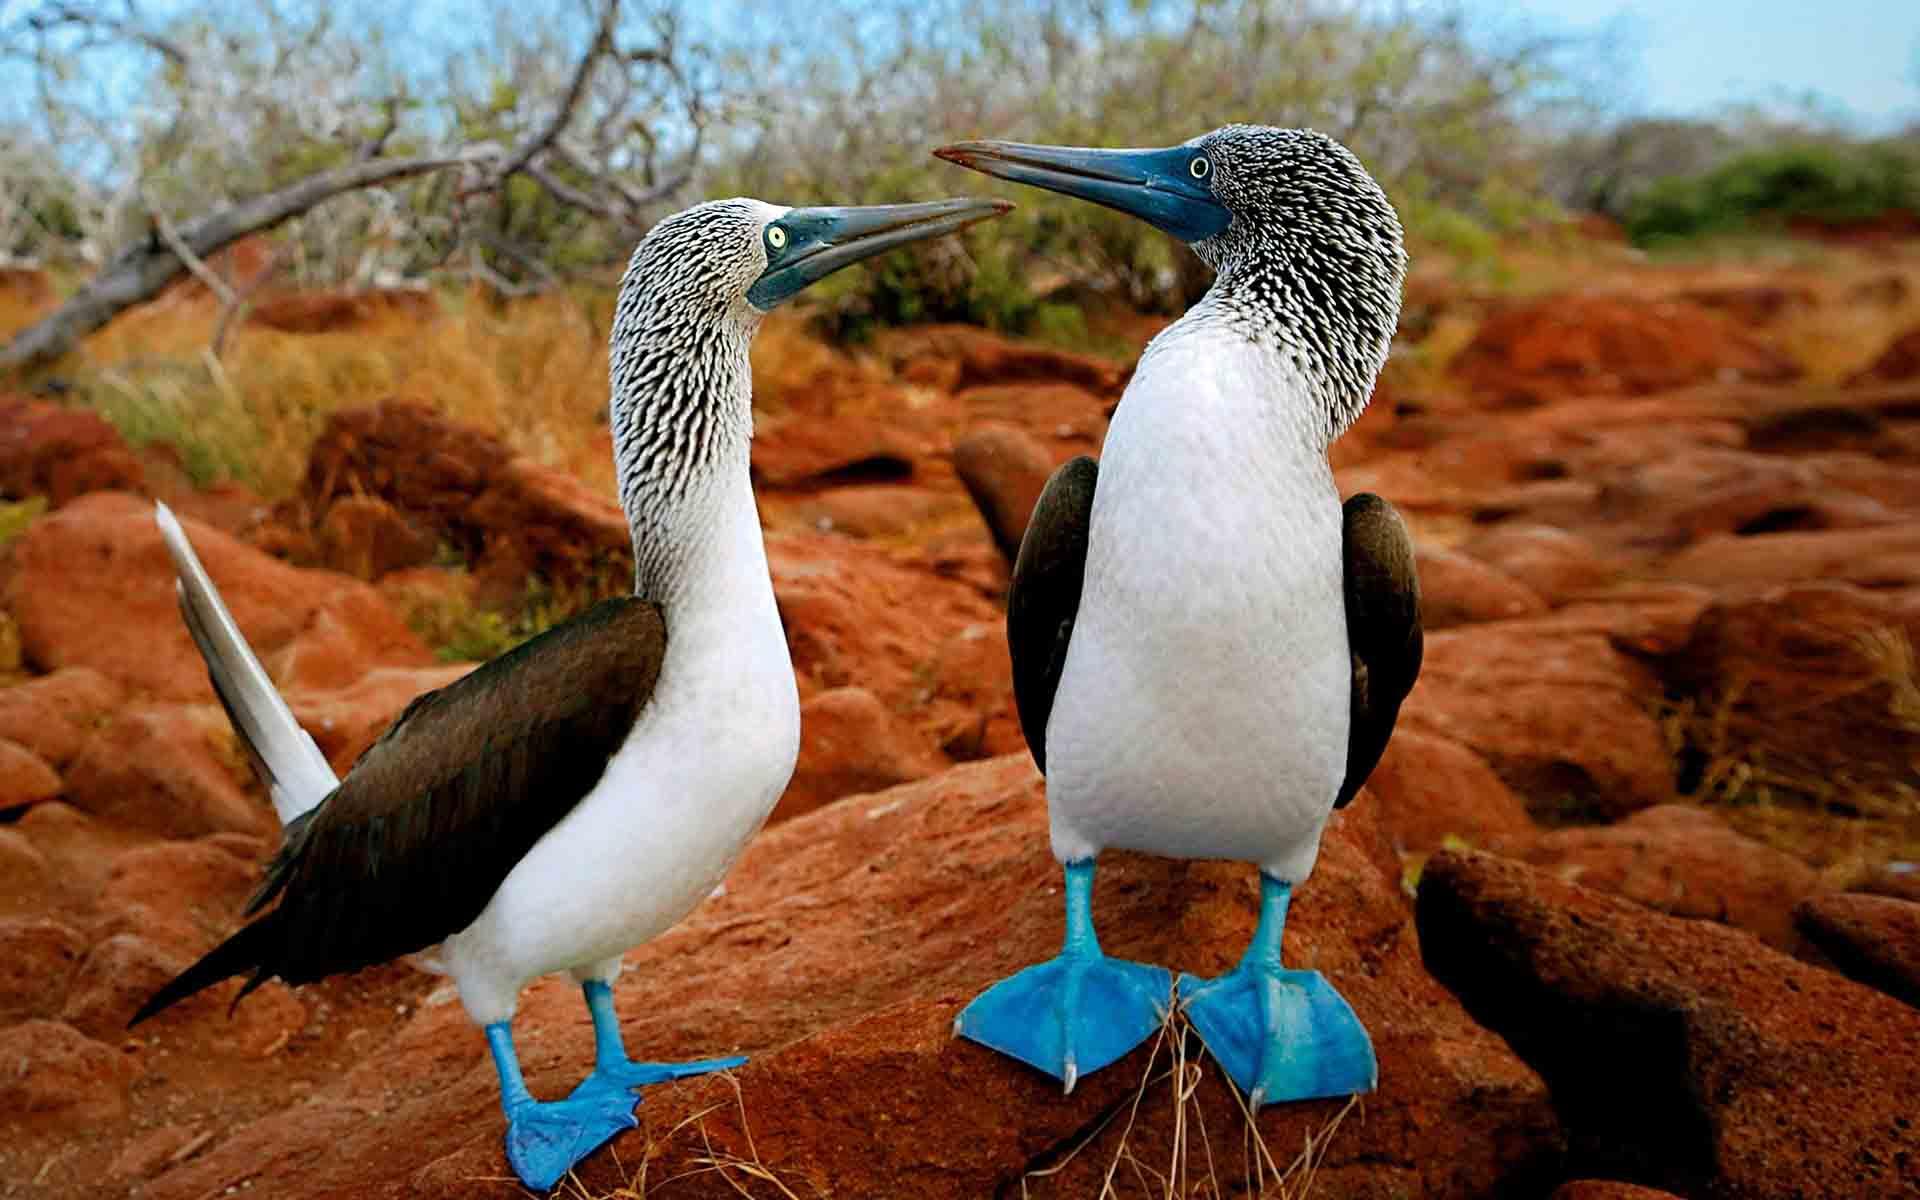 Blue-footed Booby bird on Galapagos Islands